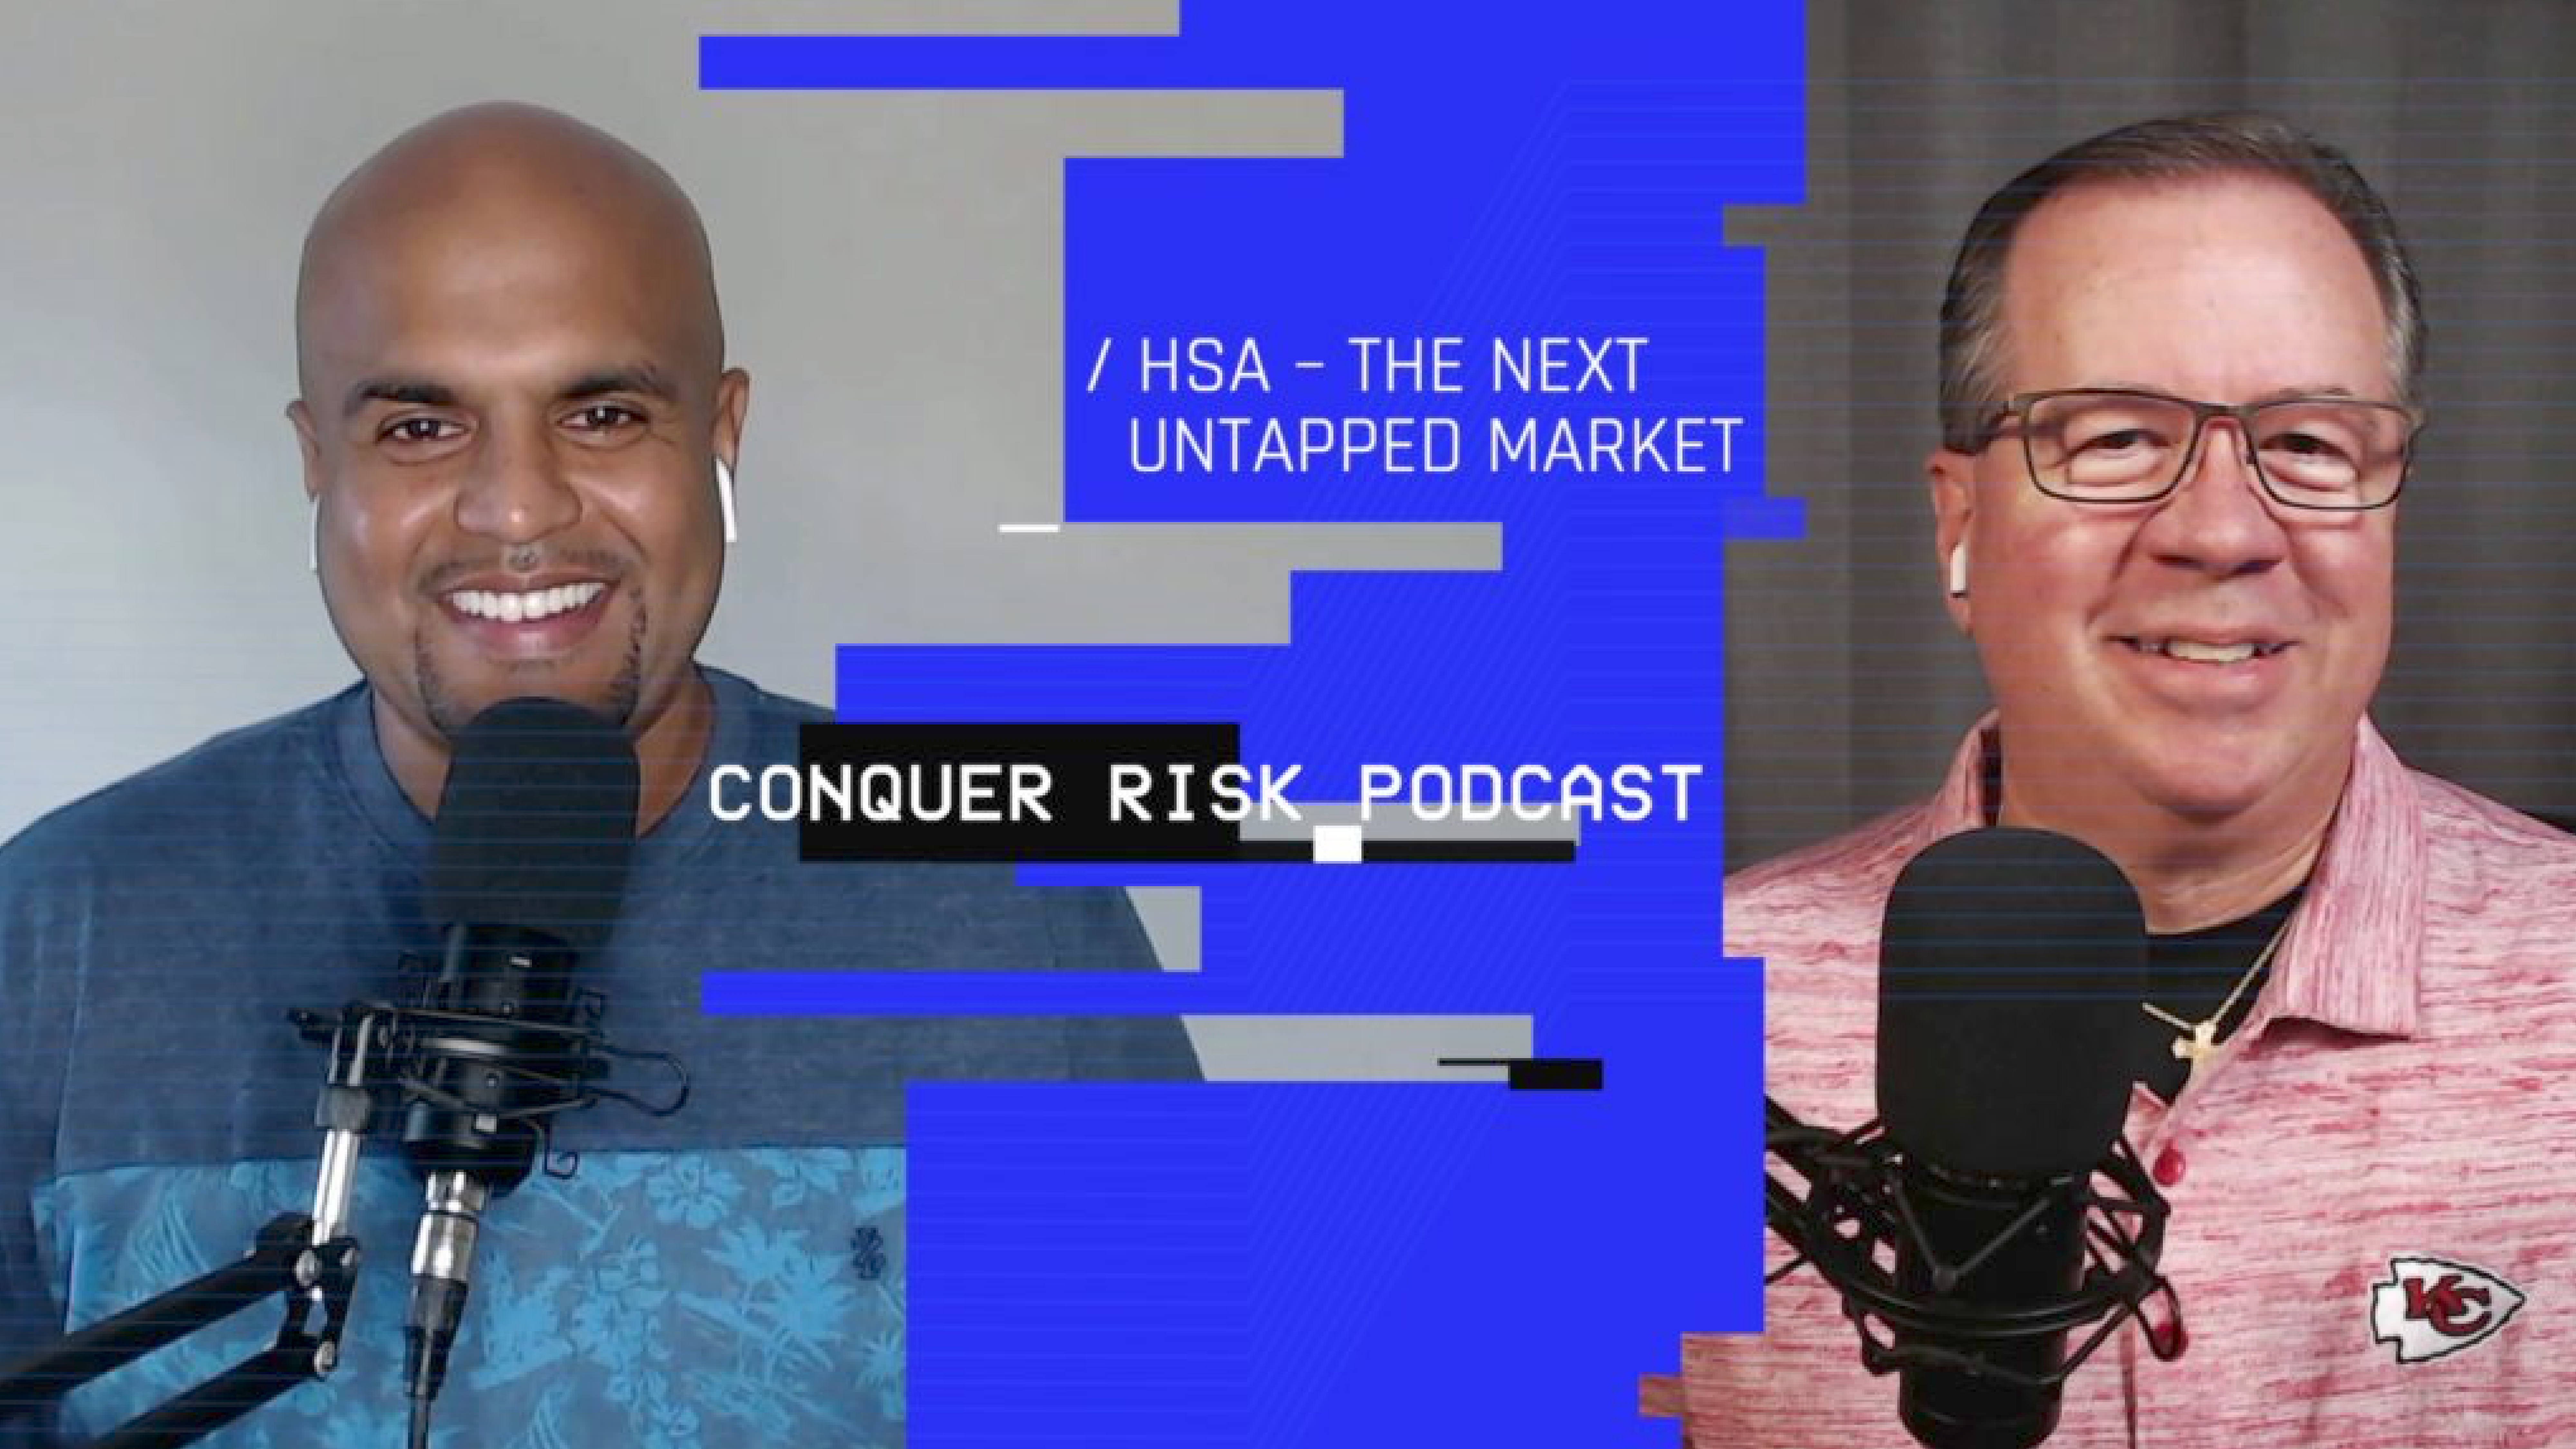 HSA – The Next Untapped Market (S1 E18)